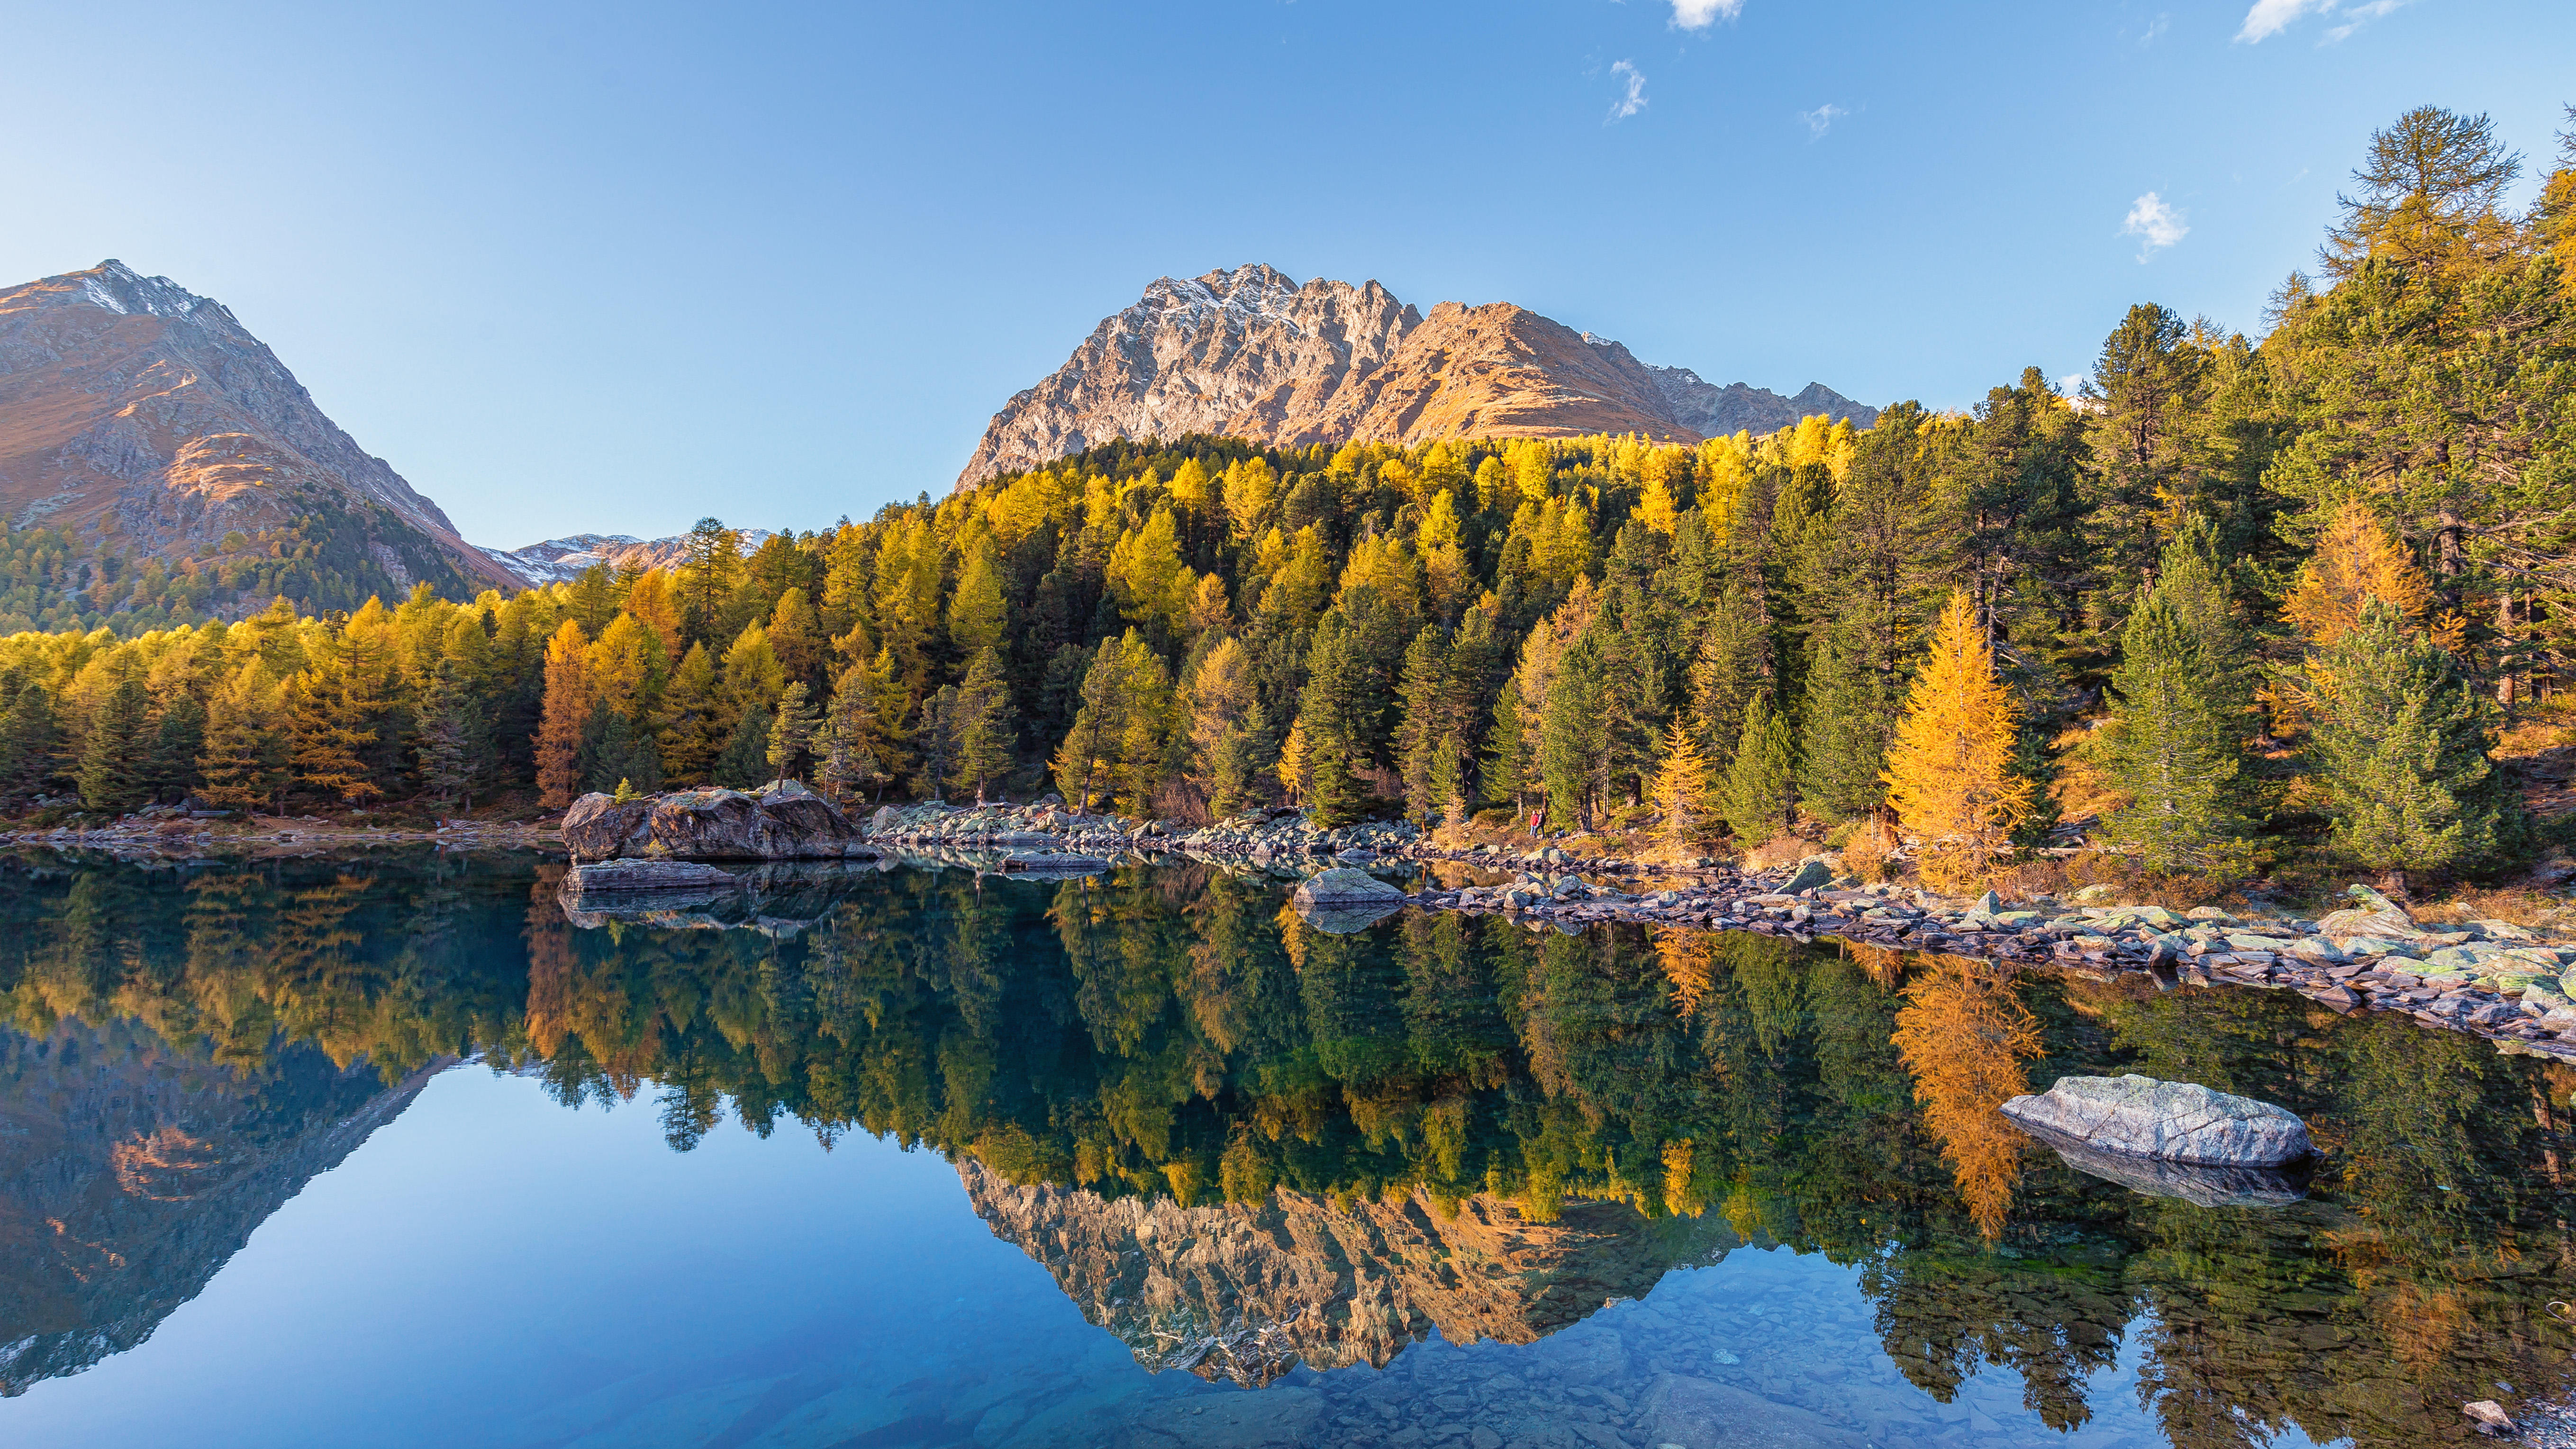 обои Озеро, Граубюнден, Швейцария, осень картинки фото